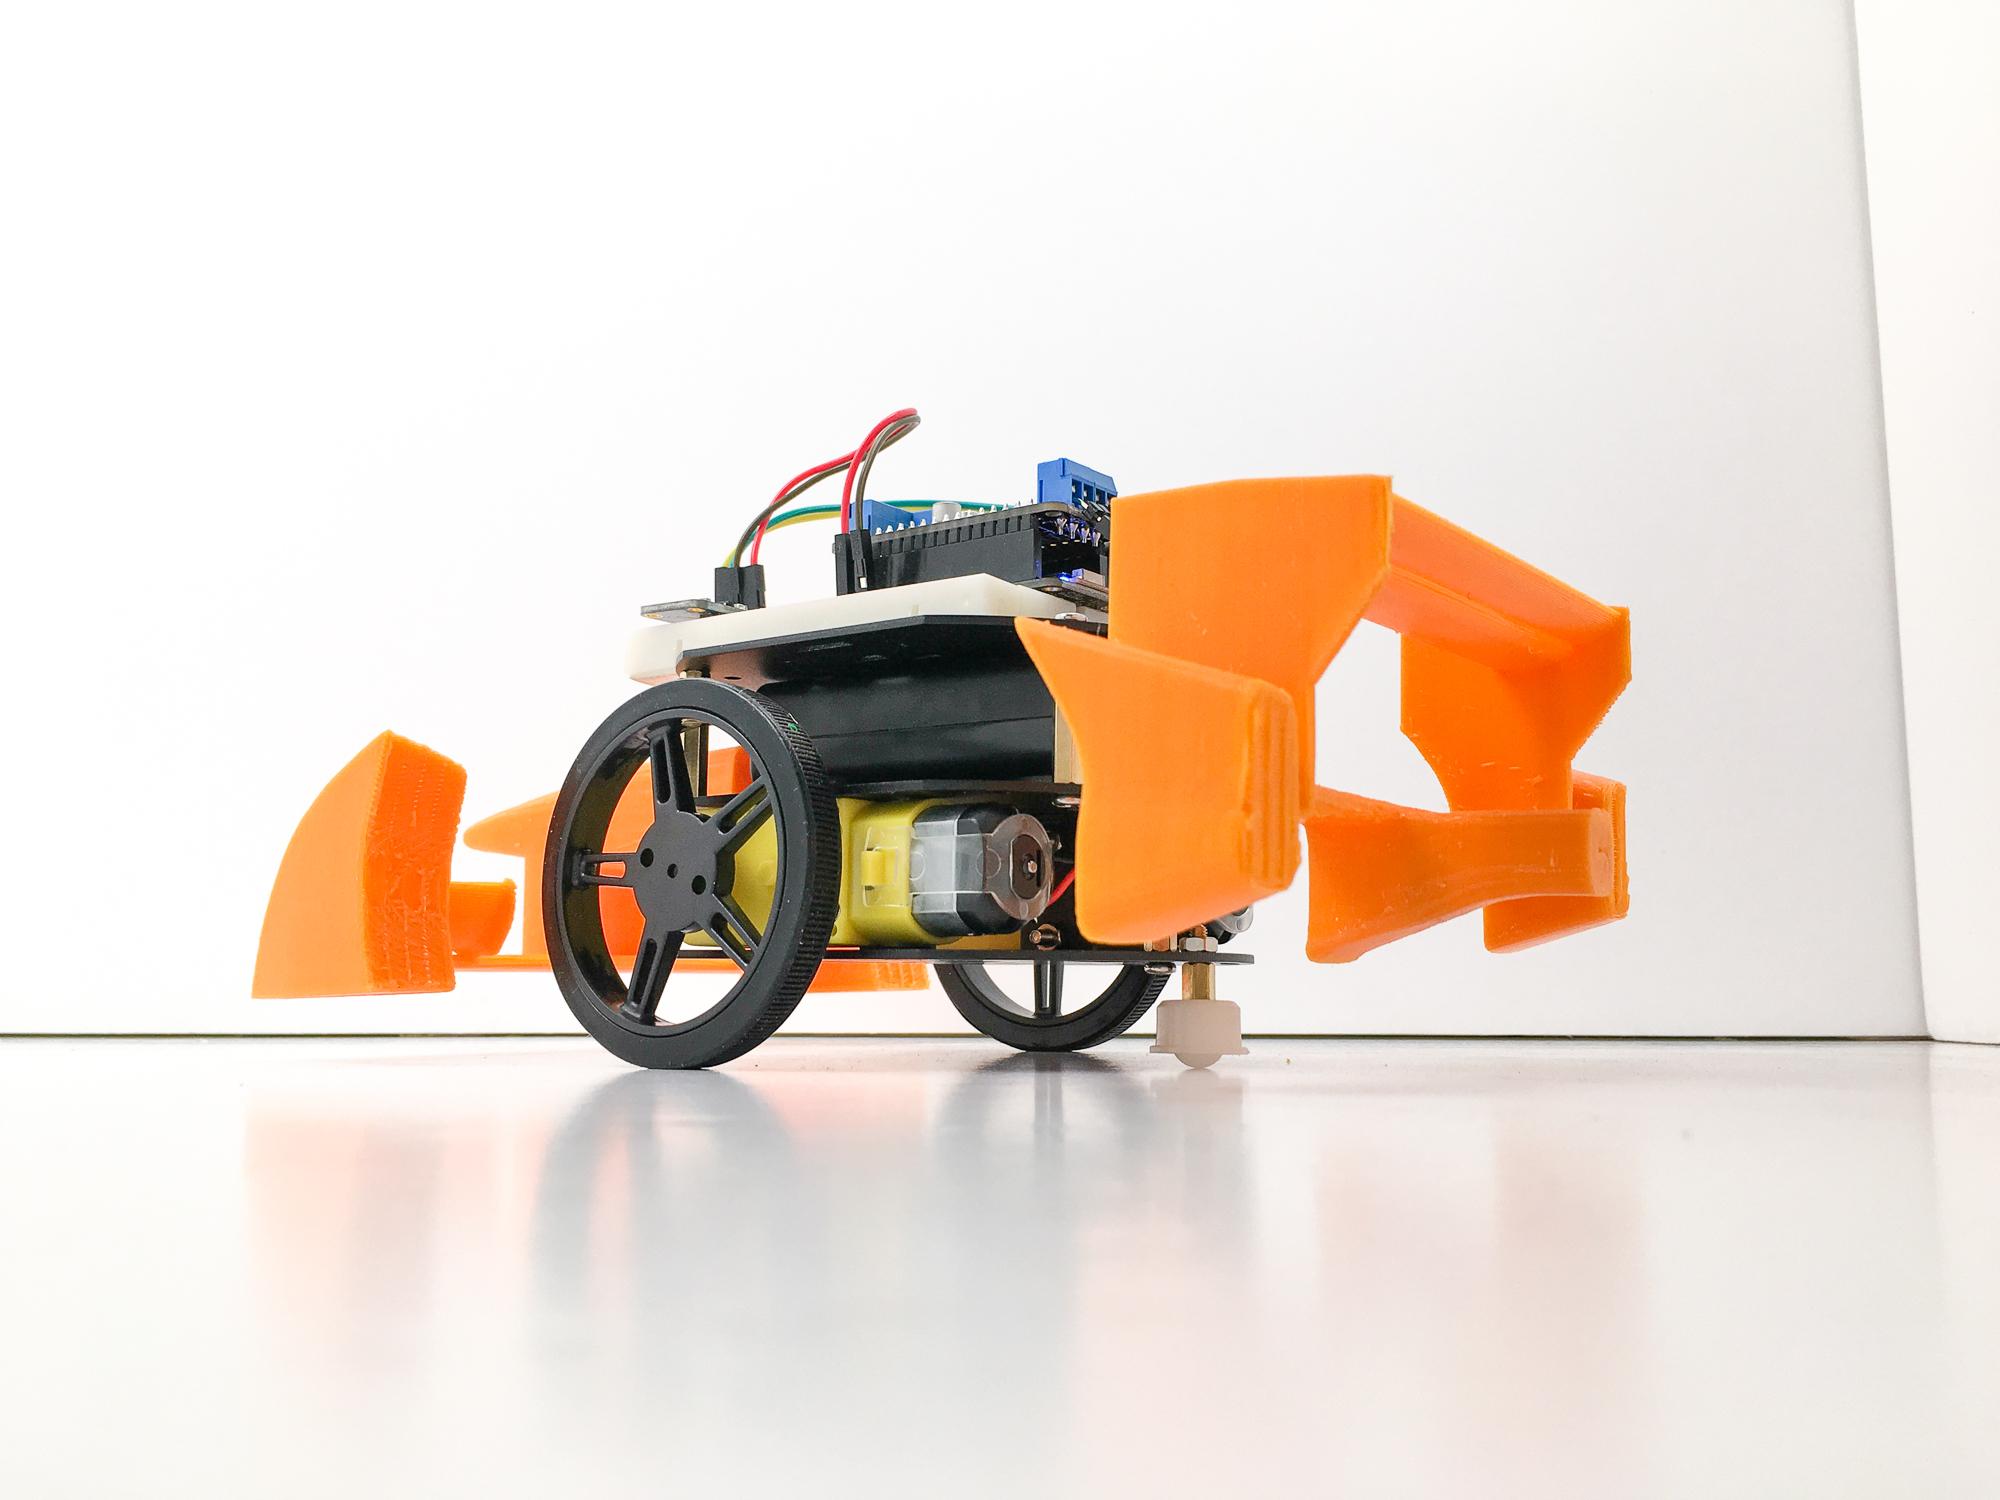 robotics_IMG_0065_2k.jpg